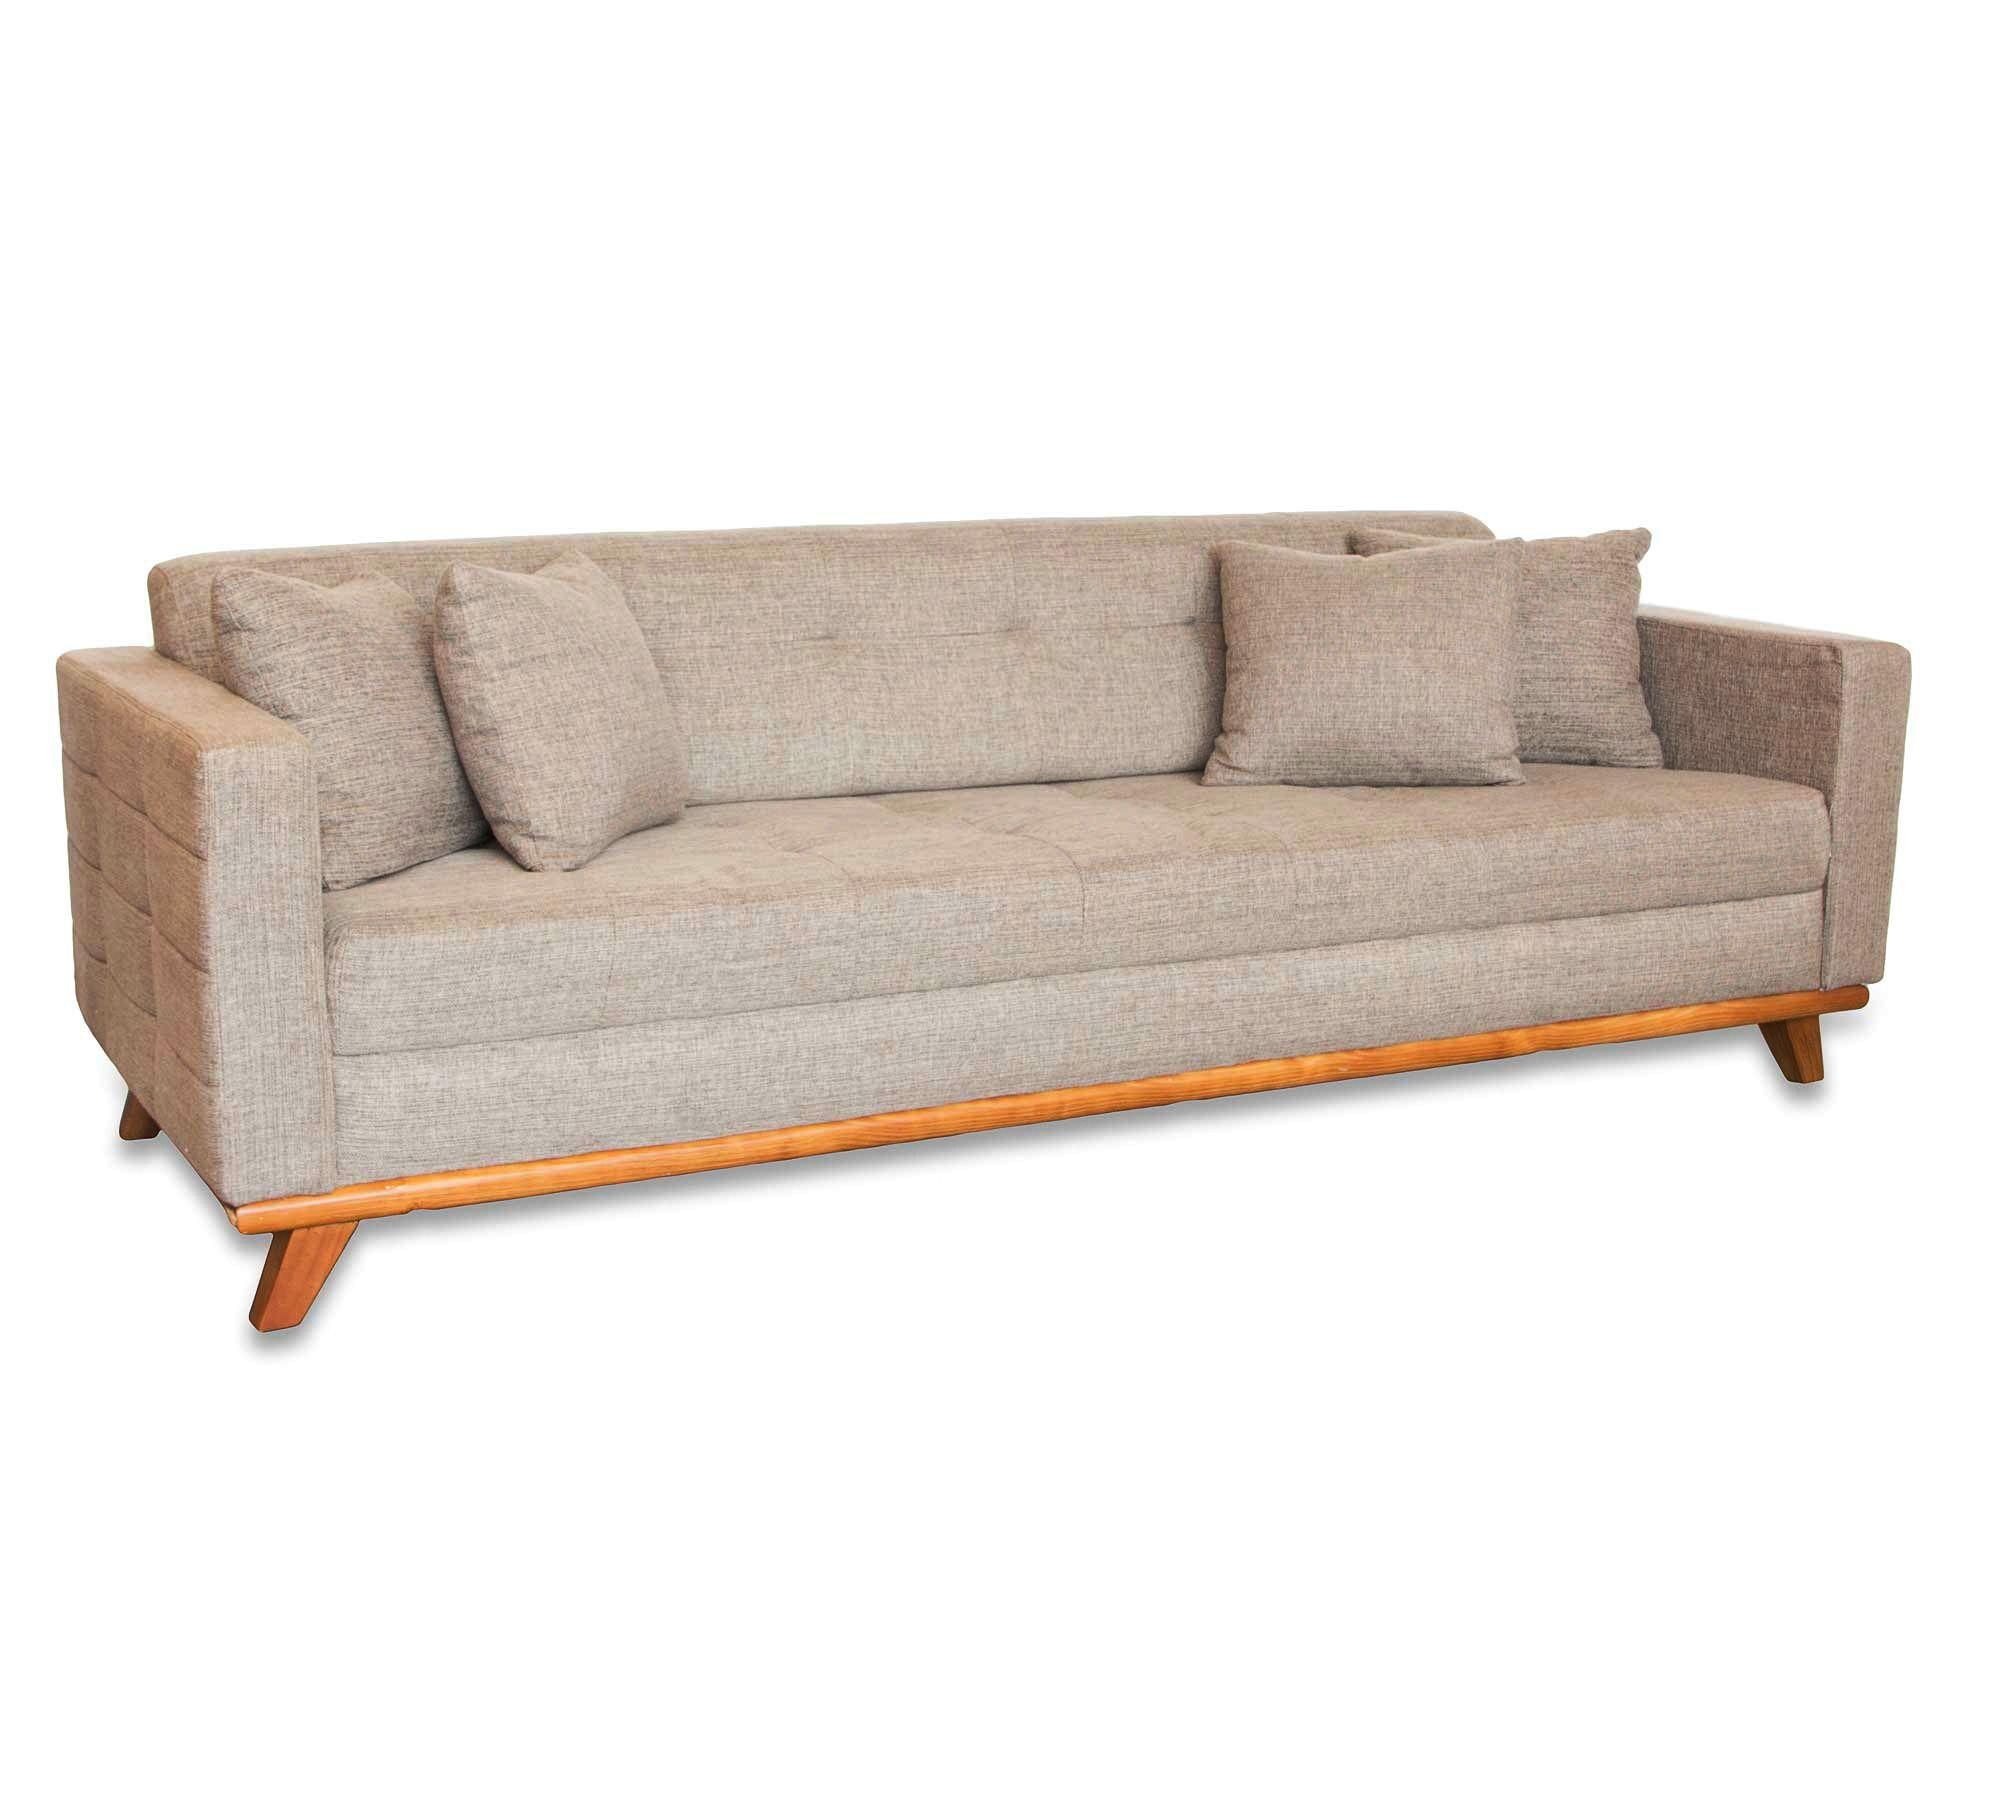 Sofa 3 lugares baroli linho etna wohnung brasilien for Sofa cama vintage